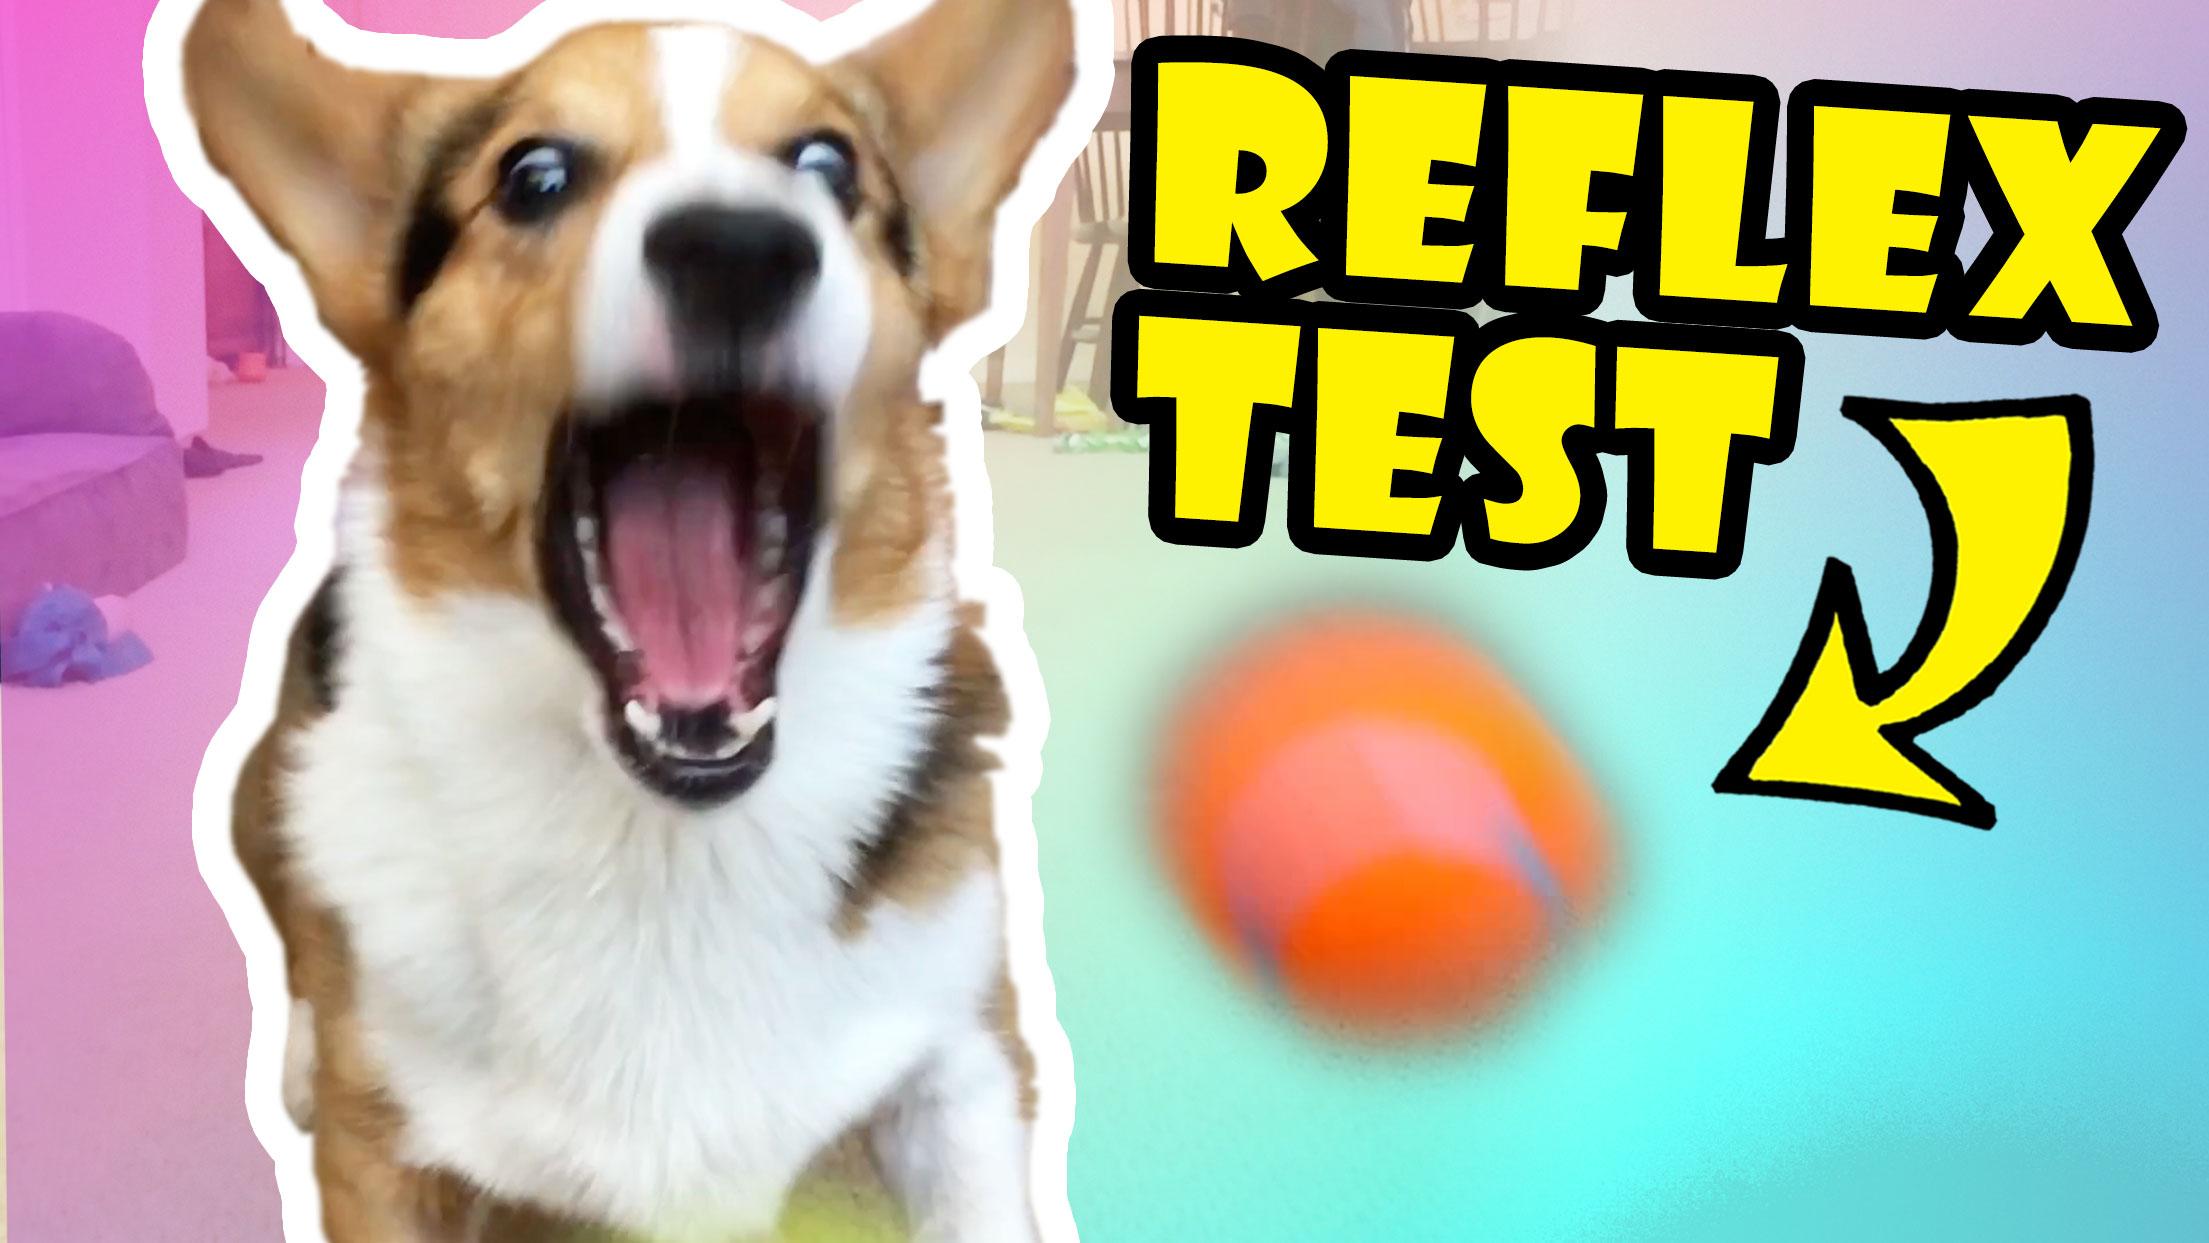 TESTING MY DOG'S REFLEXES -- Corgis FTW!